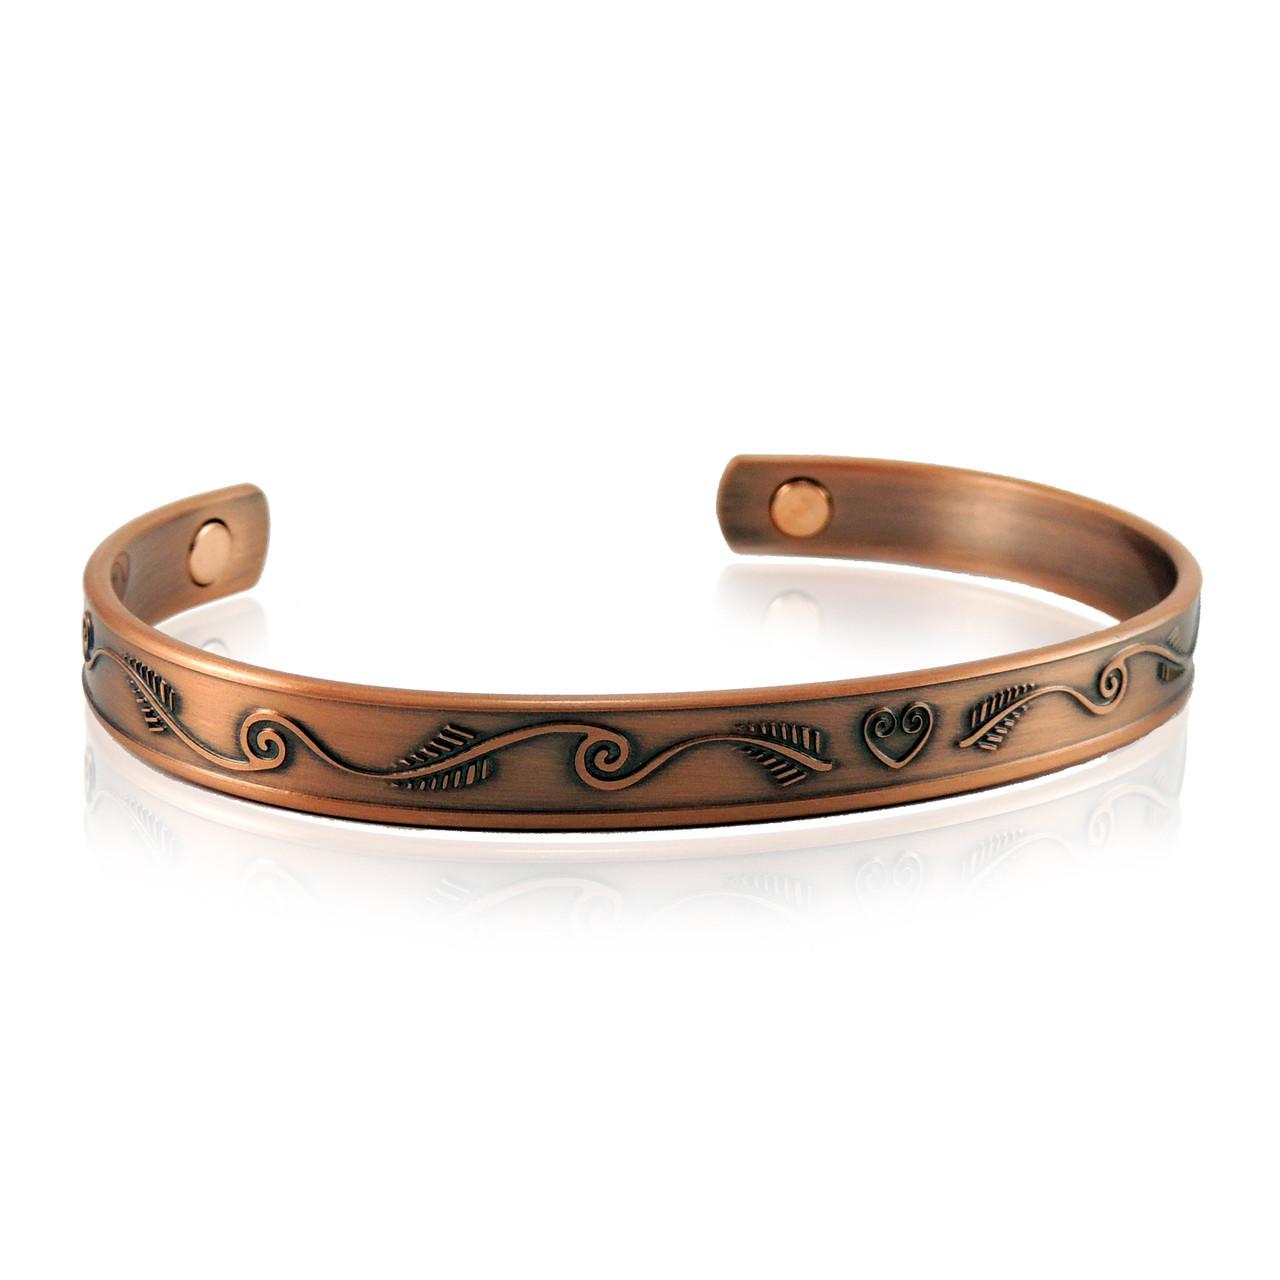 C-KCB004 Copper Bracelet